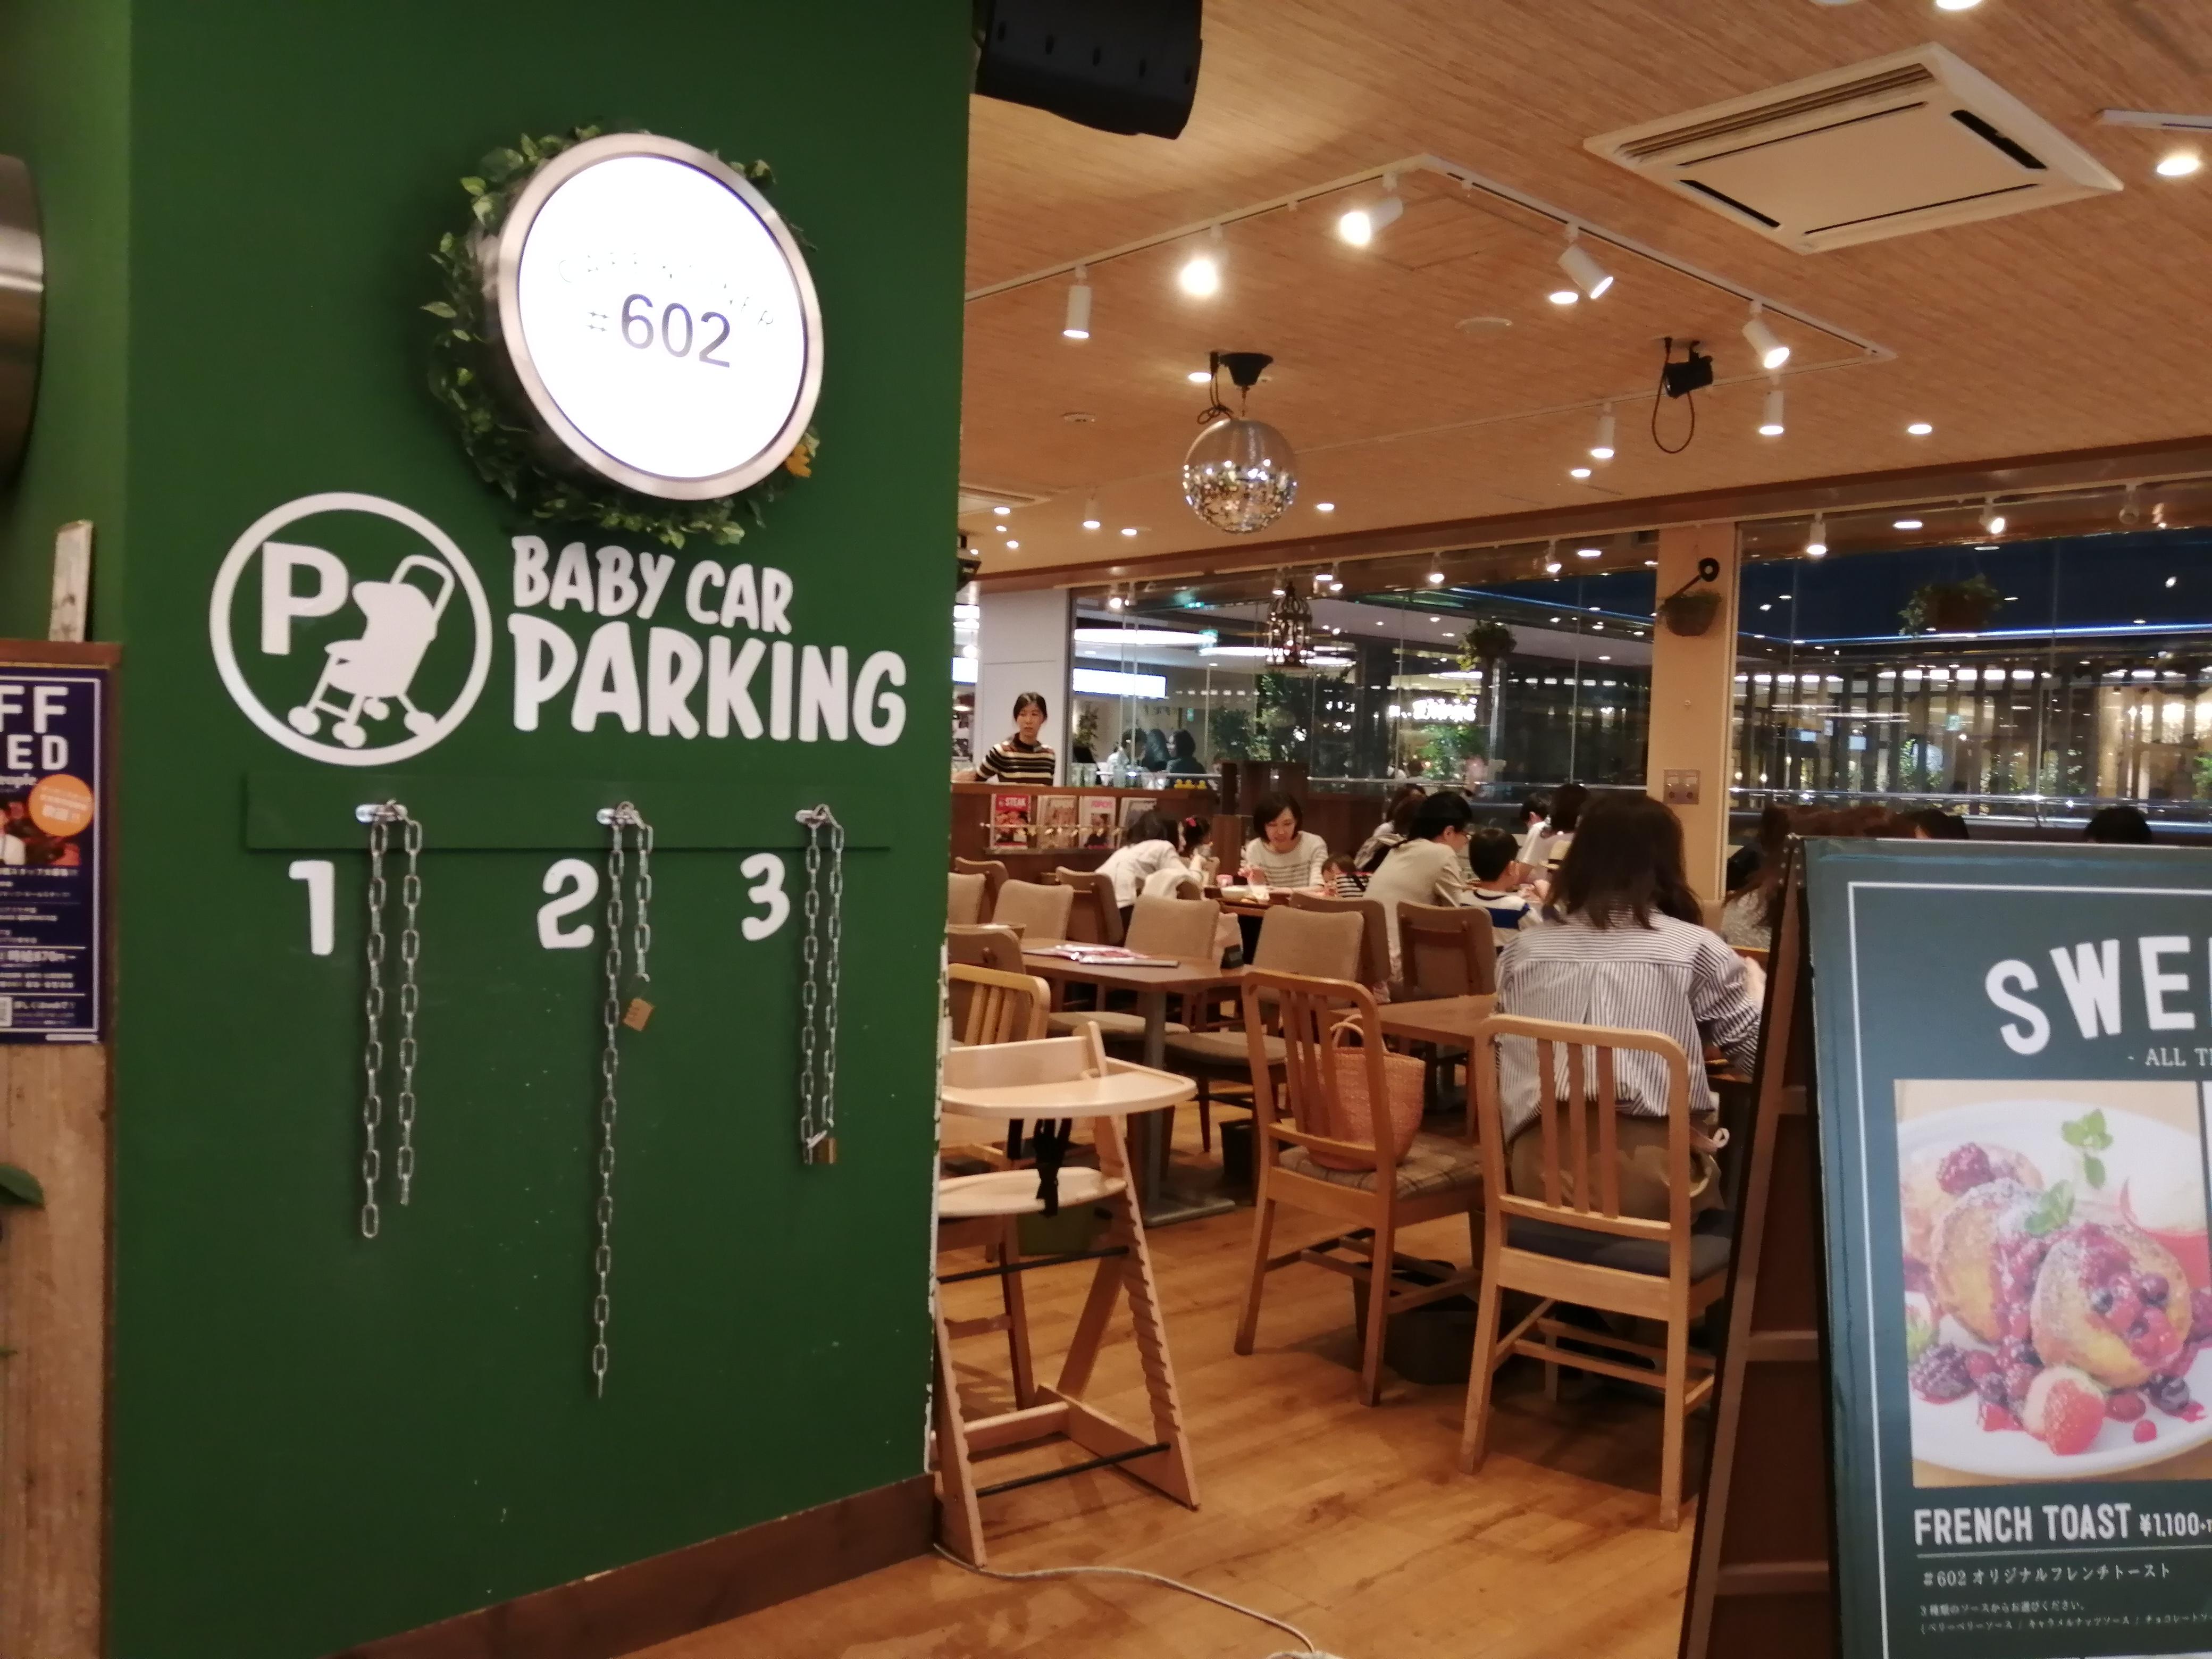 「#602 CAFE&DINER(ロクマルニ カフェ&ダイナー)」のベビーカー置き場